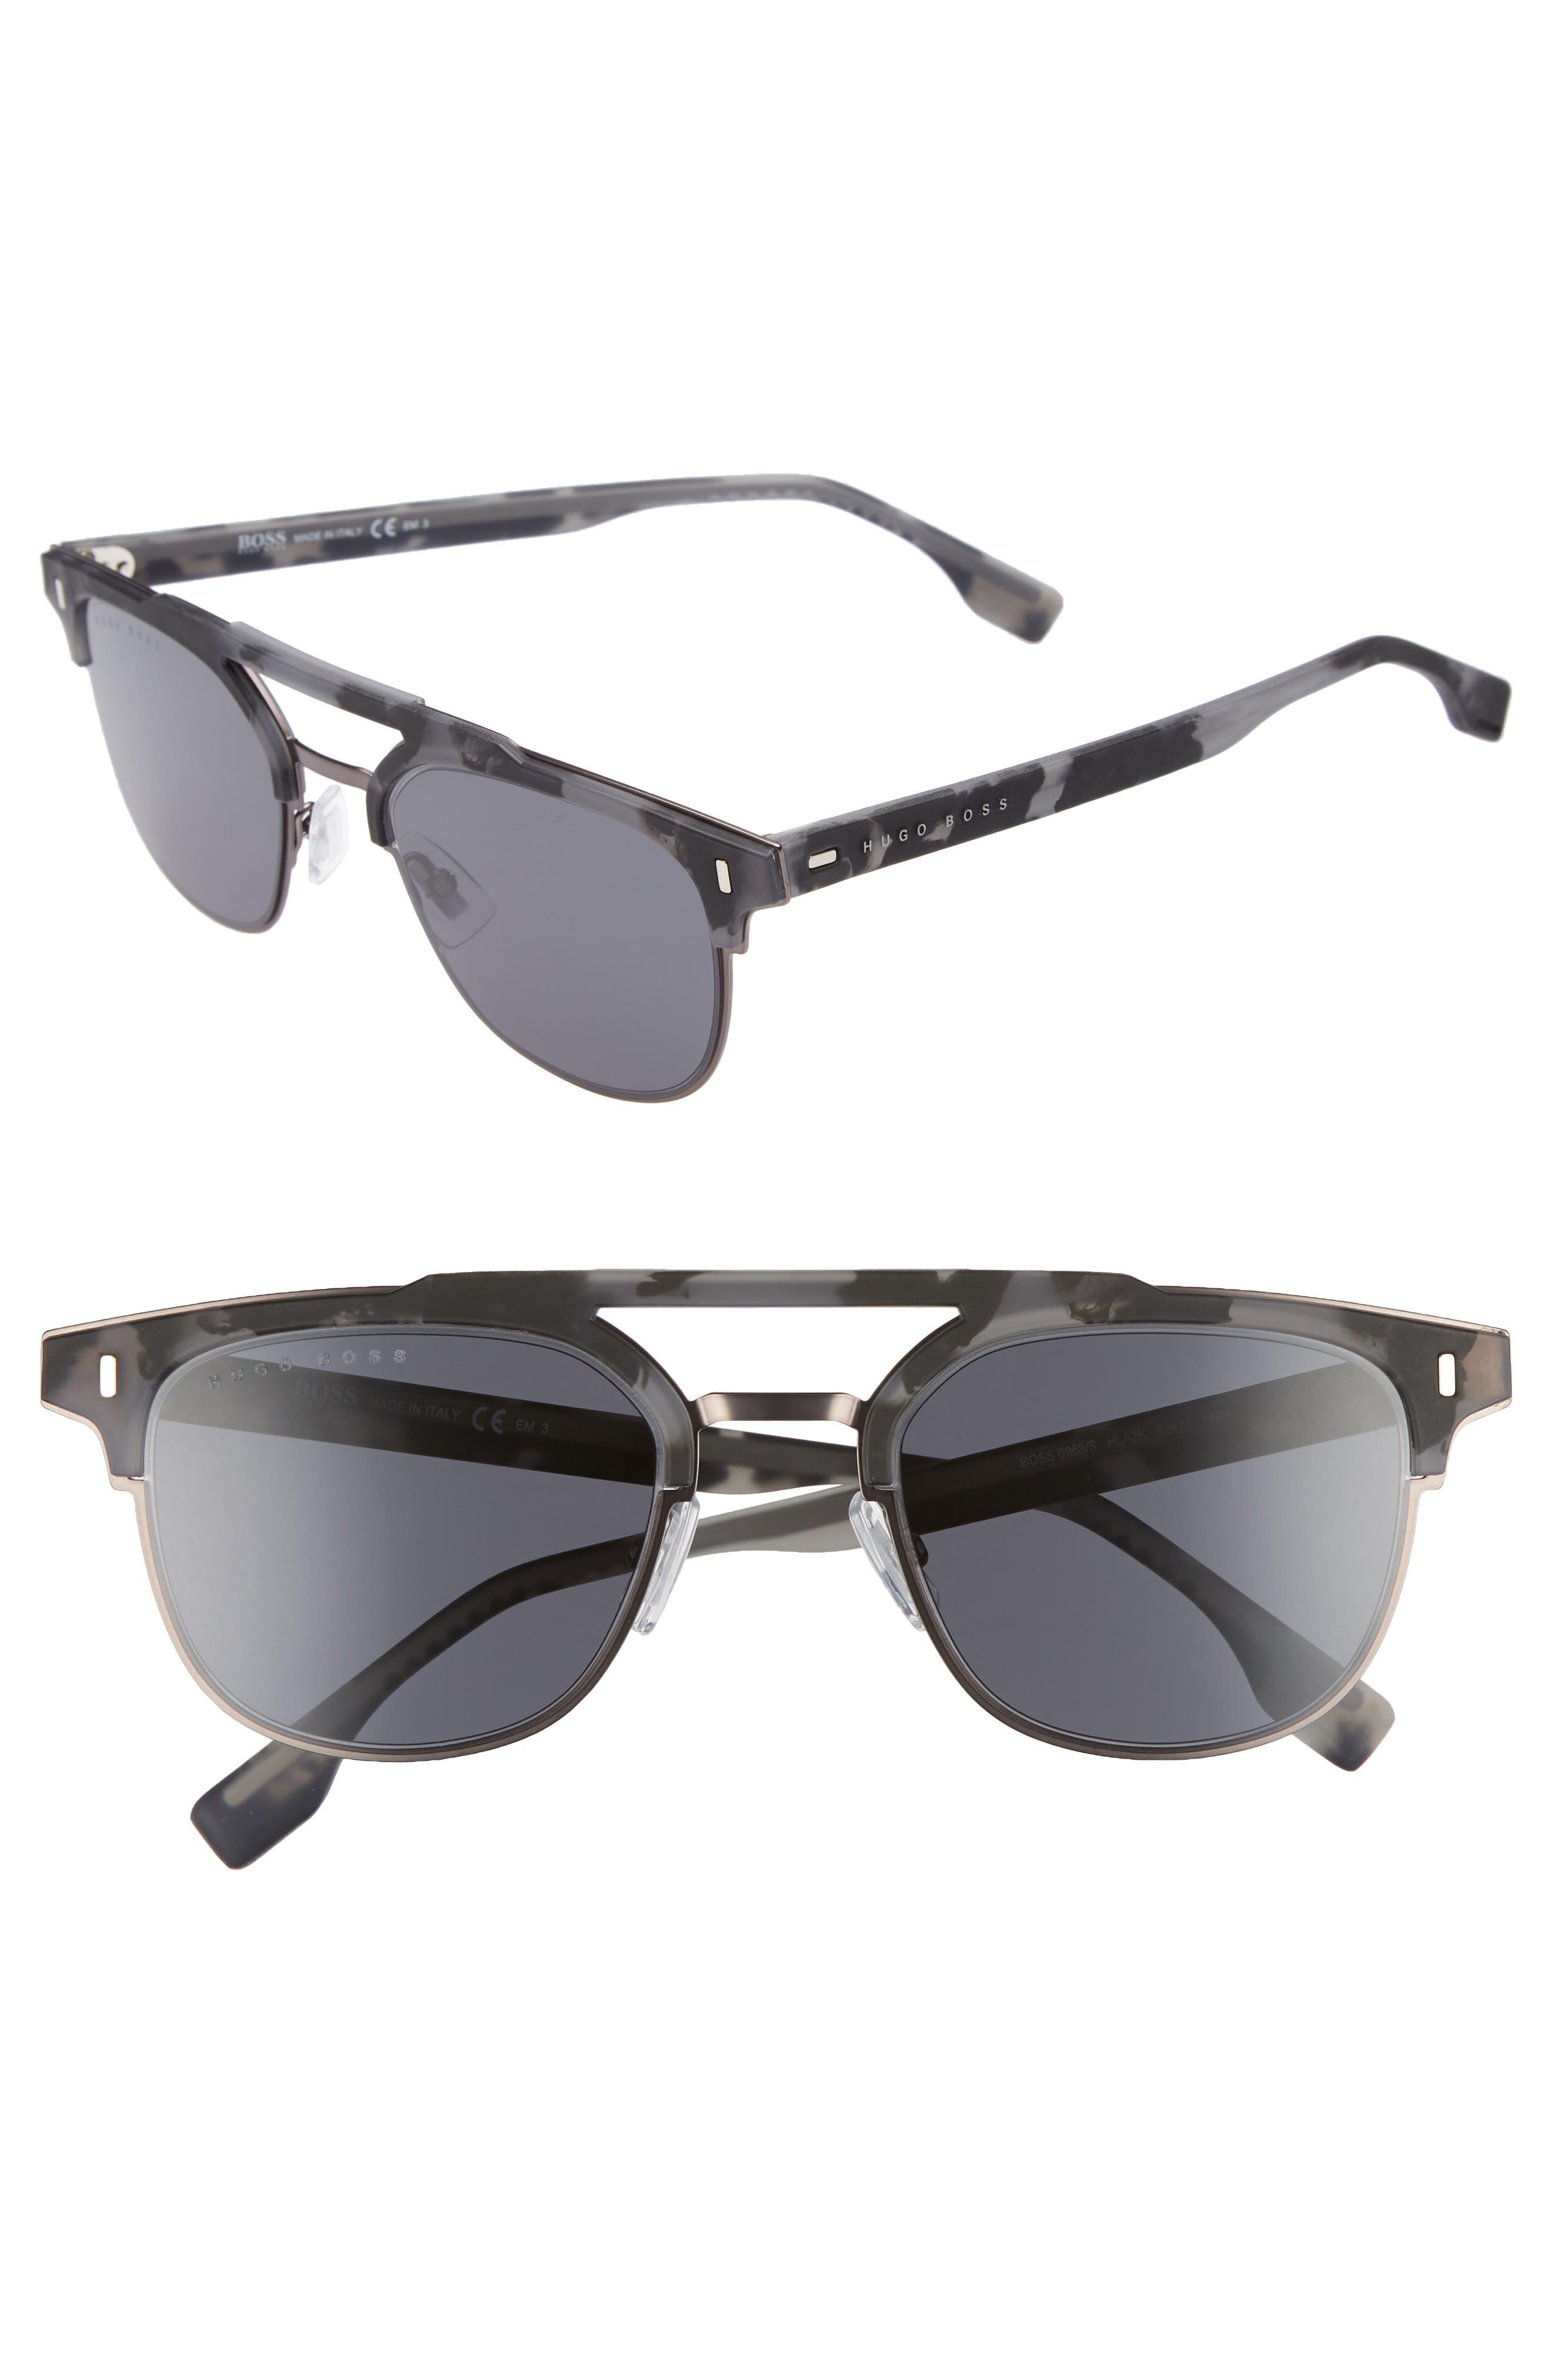 52mm Sunglasses,                             Main thumbnail 1, color,                             Mud Havana Rose